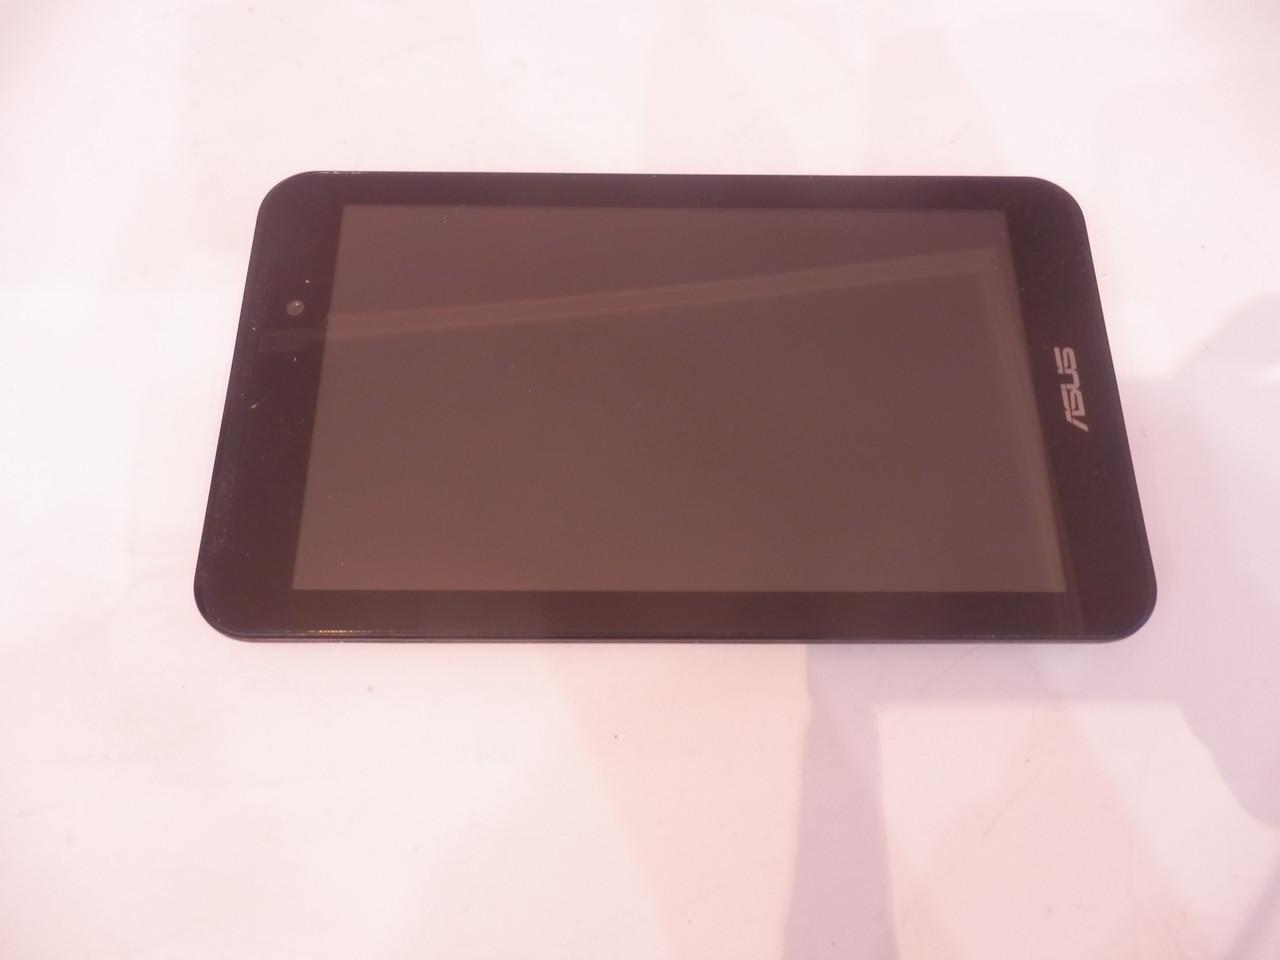 Планшет Asus tablet k01a №4891